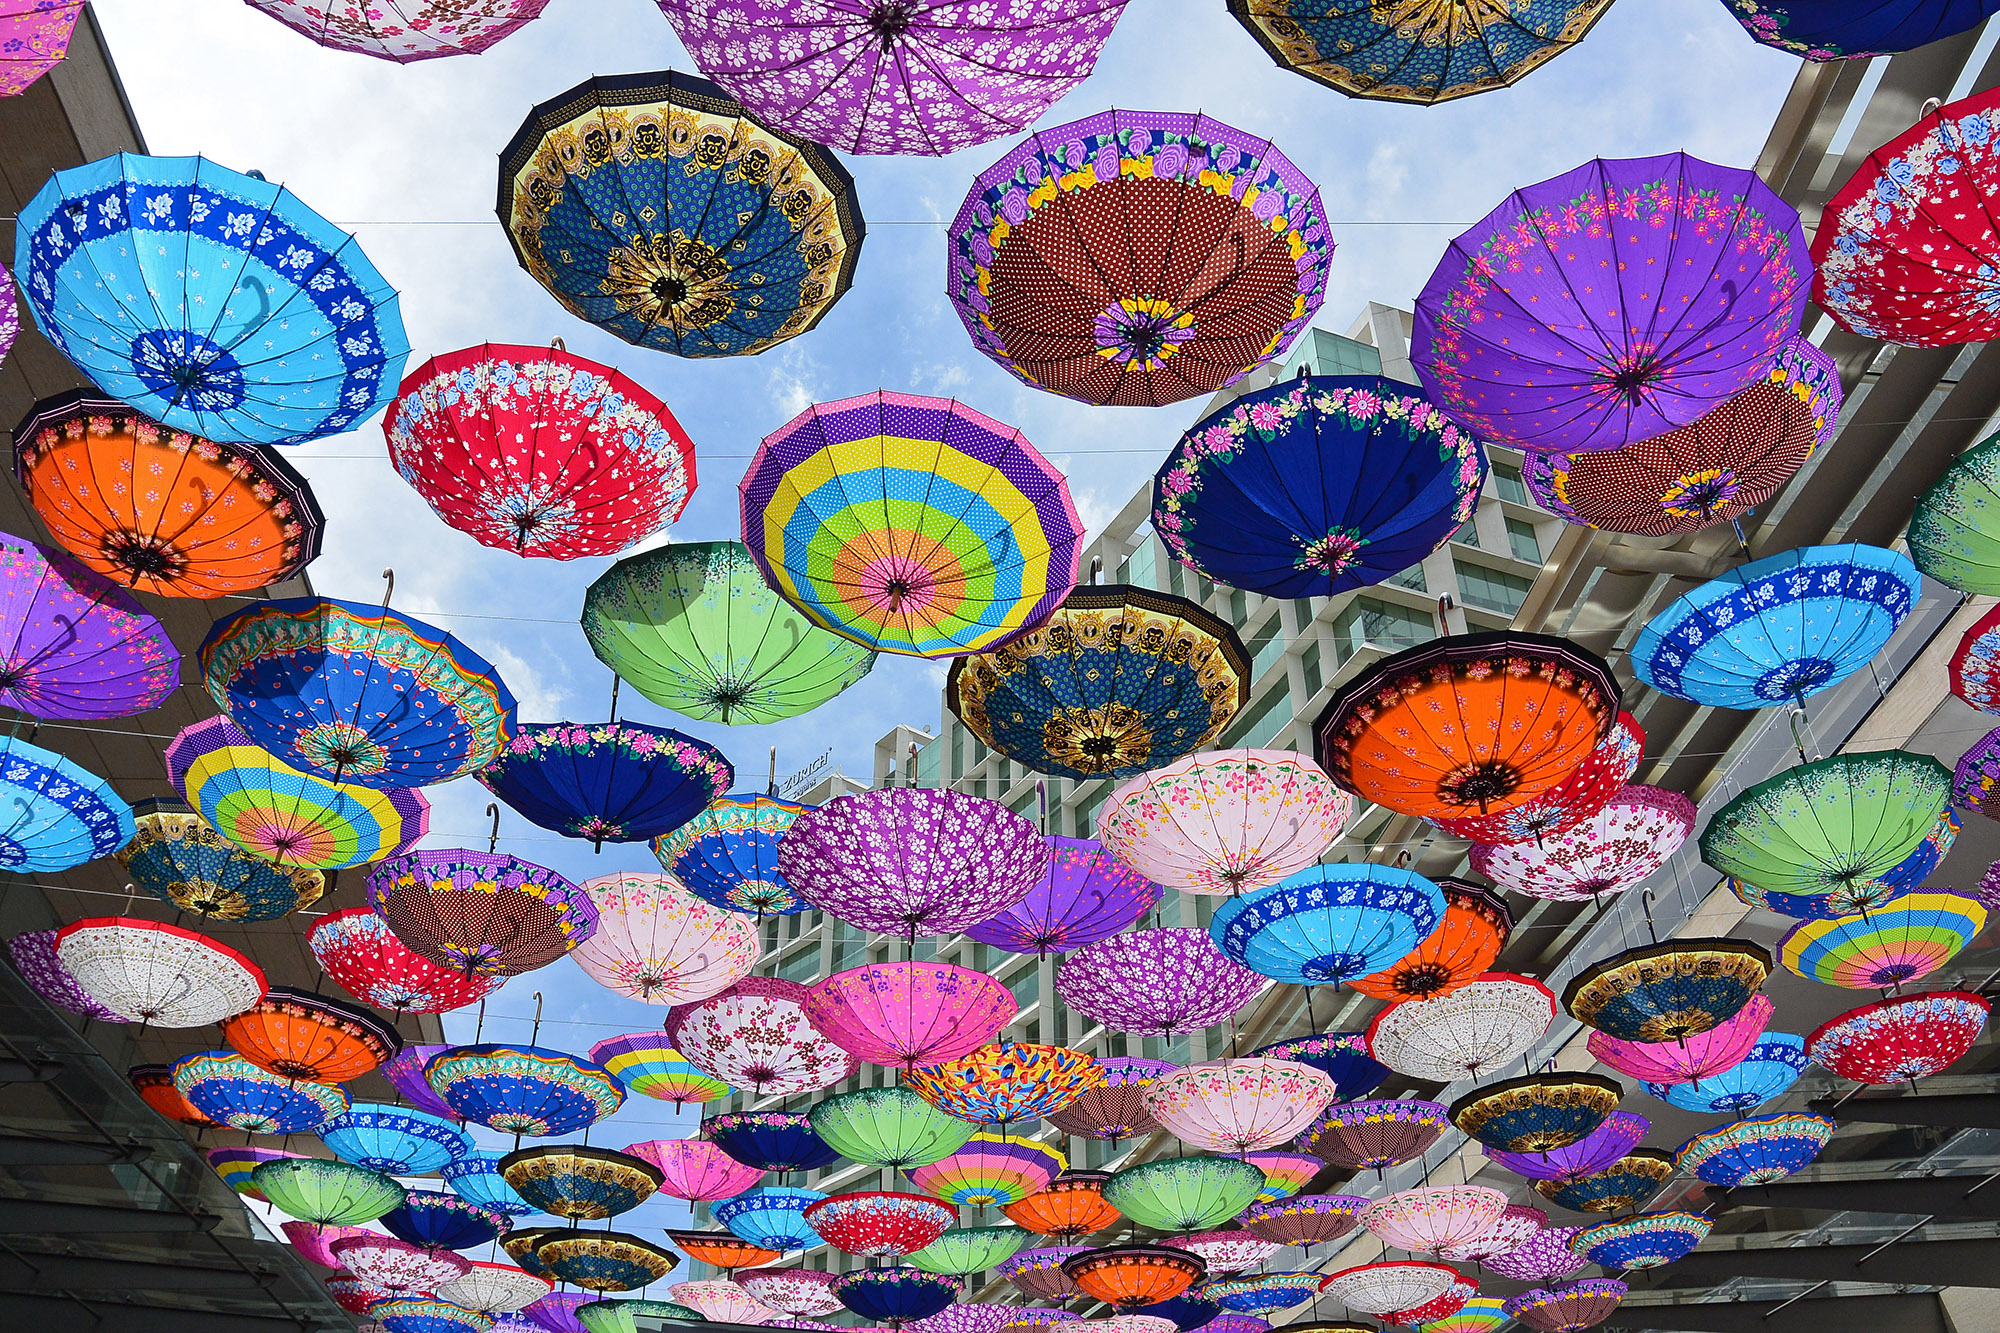 Free Things to do in Mexico City - Polanco Umbrellas